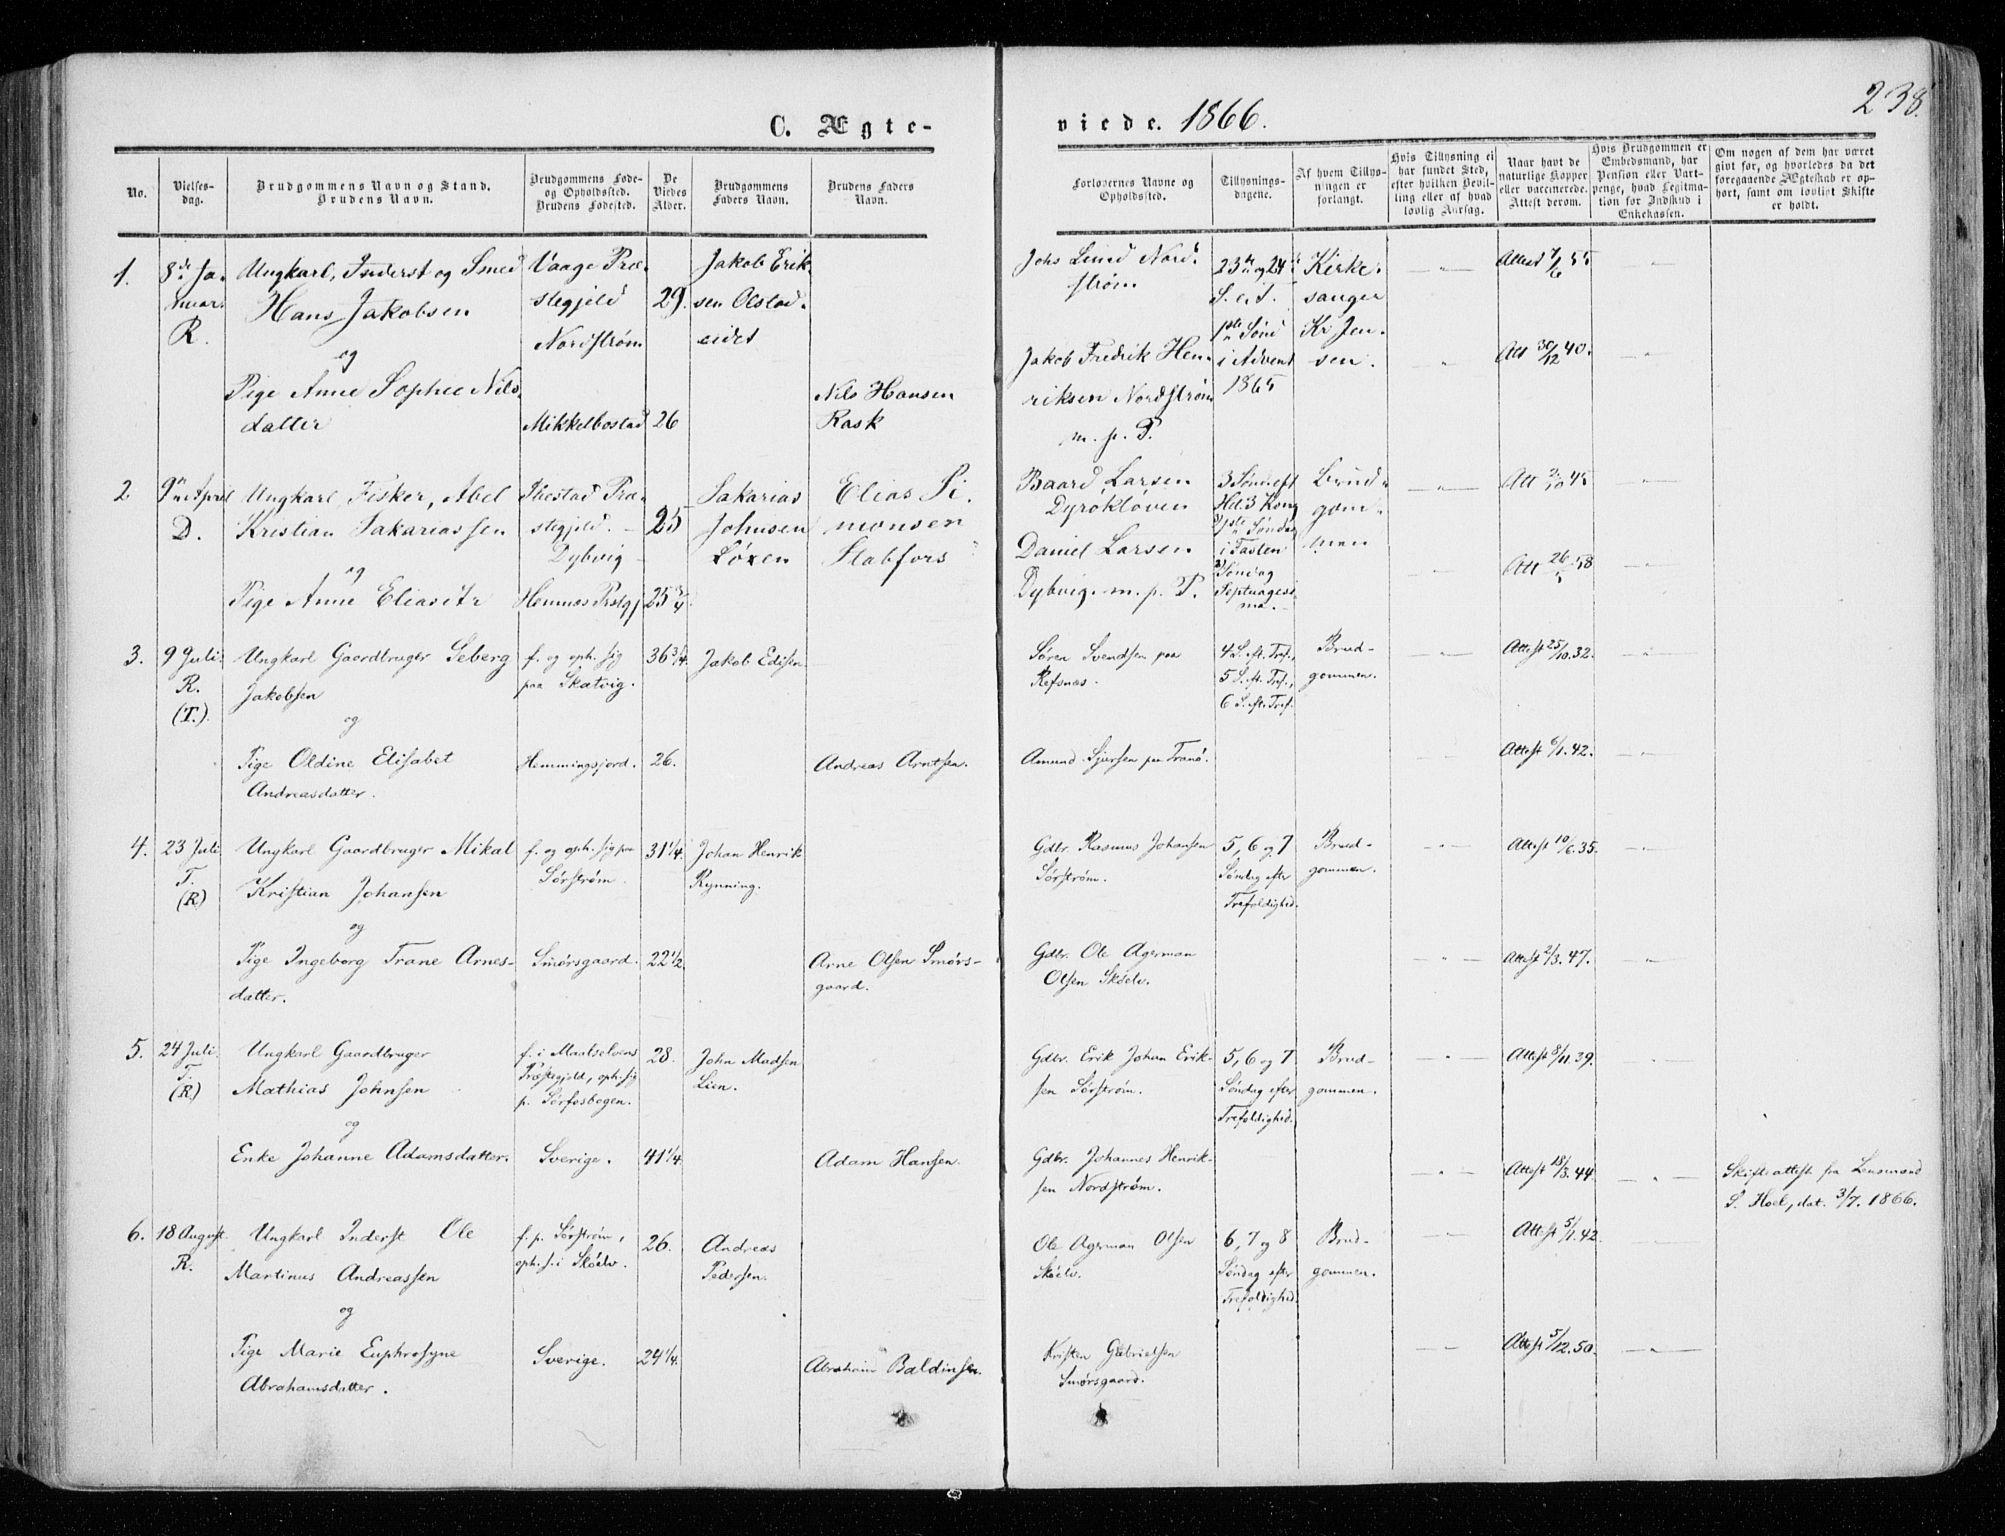 SATØ, Tranøy sokneprestkontor, I/Ia/Iaa/L0007kirke: Ministerialbok nr. 7, 1856-1866, s. 238